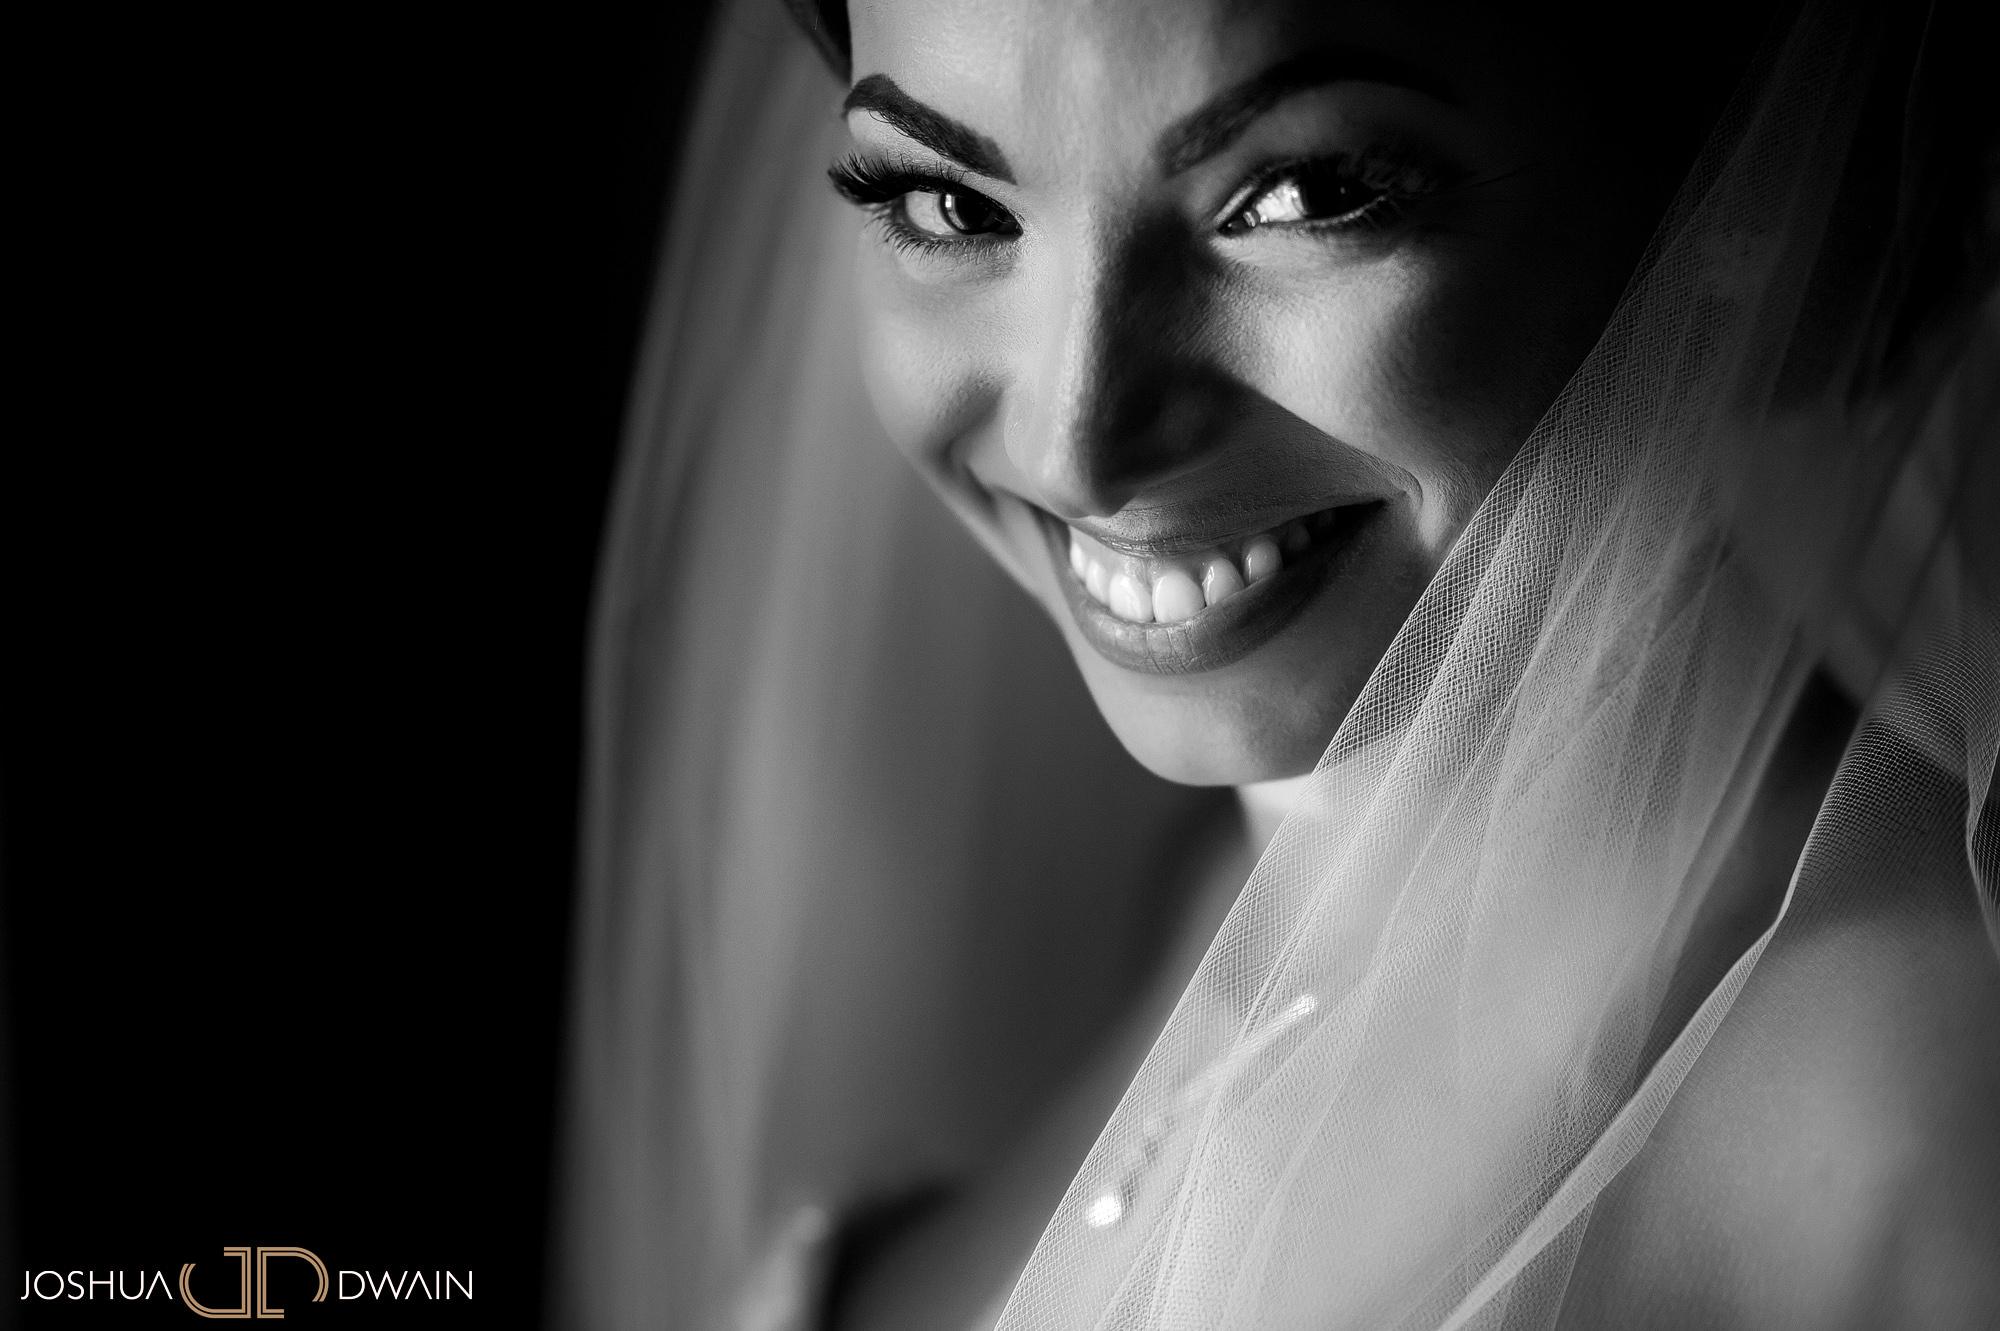 joshua-dwain-weddings-gallery-best-wedding-photographers-us-054